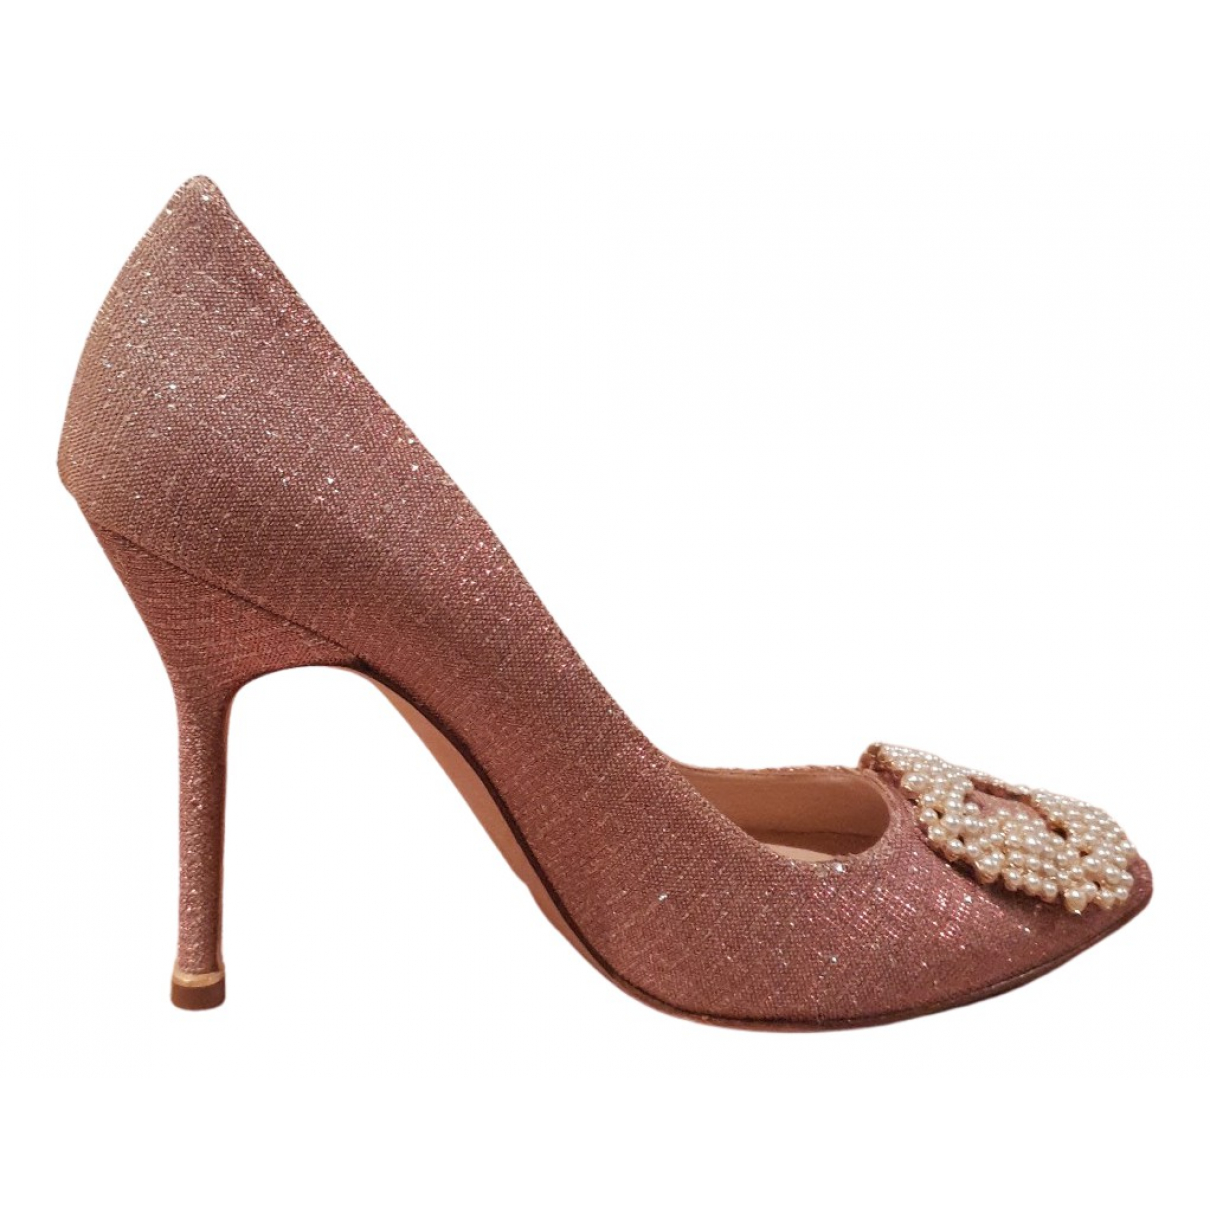 Manolo Blahnik Hangisi Pink Glitter Heels for Women 38 EU